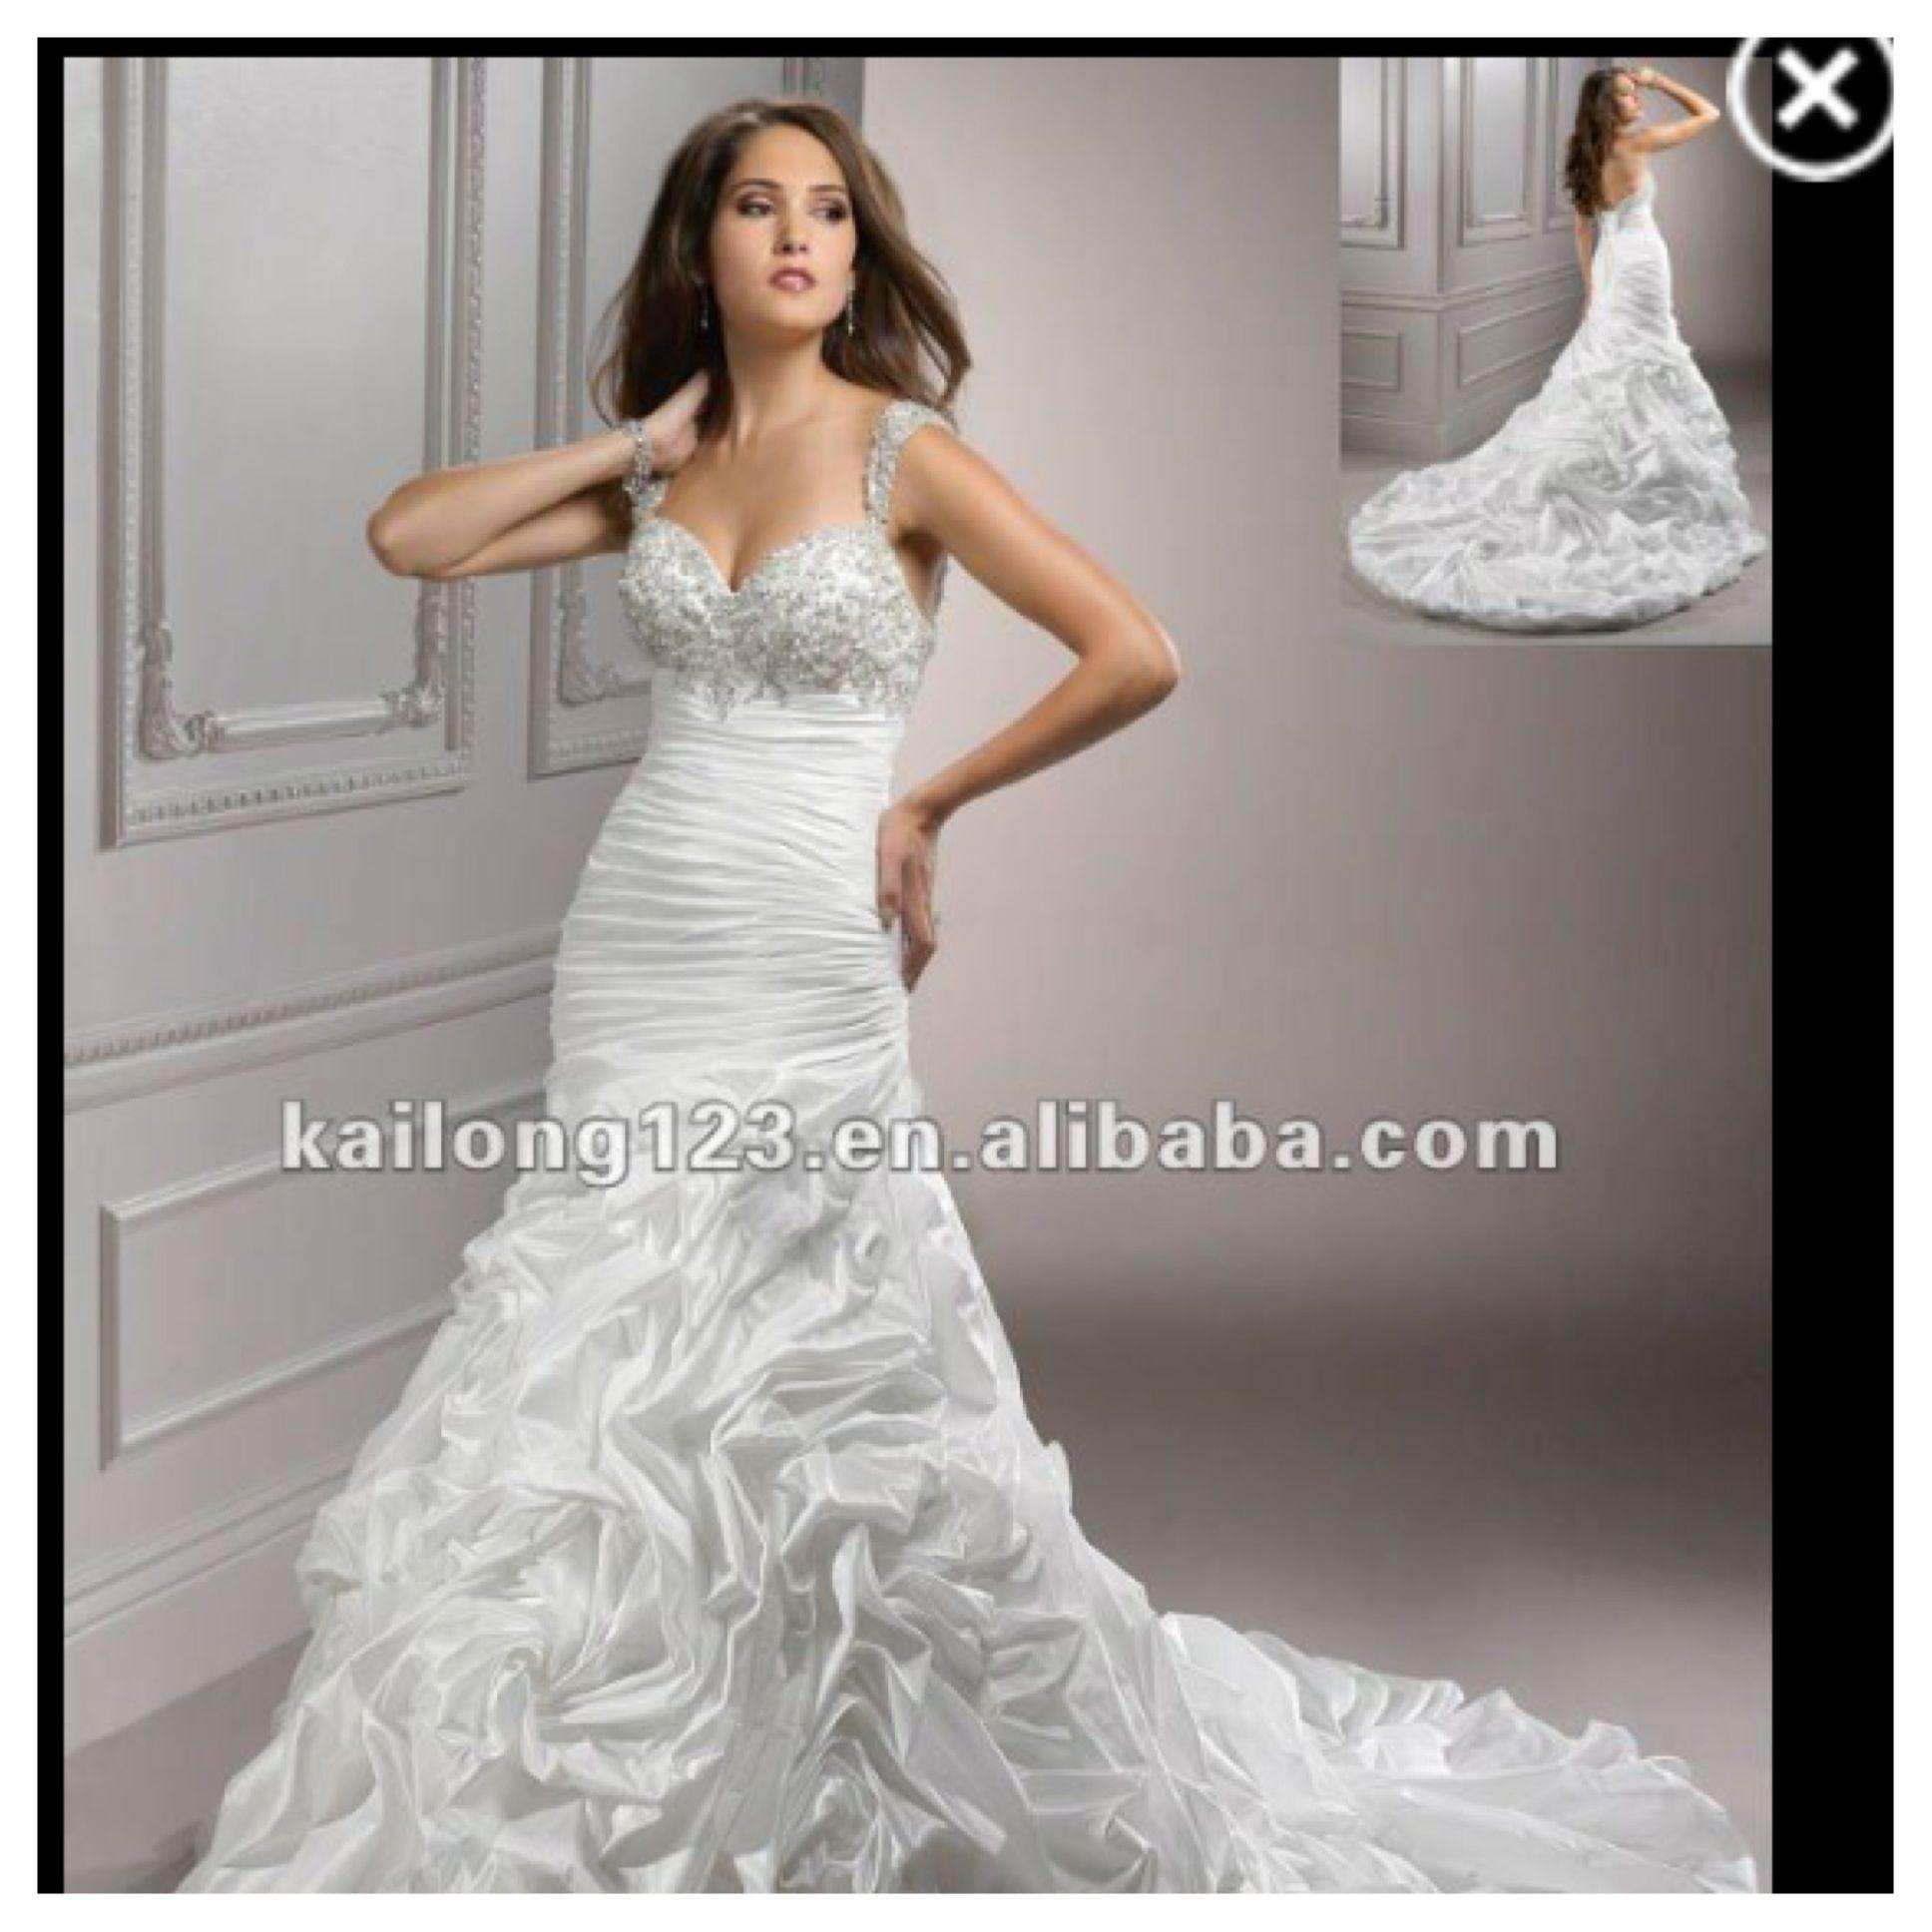 Beautiful Mermaid dress w bling bodice and ruffled skirt